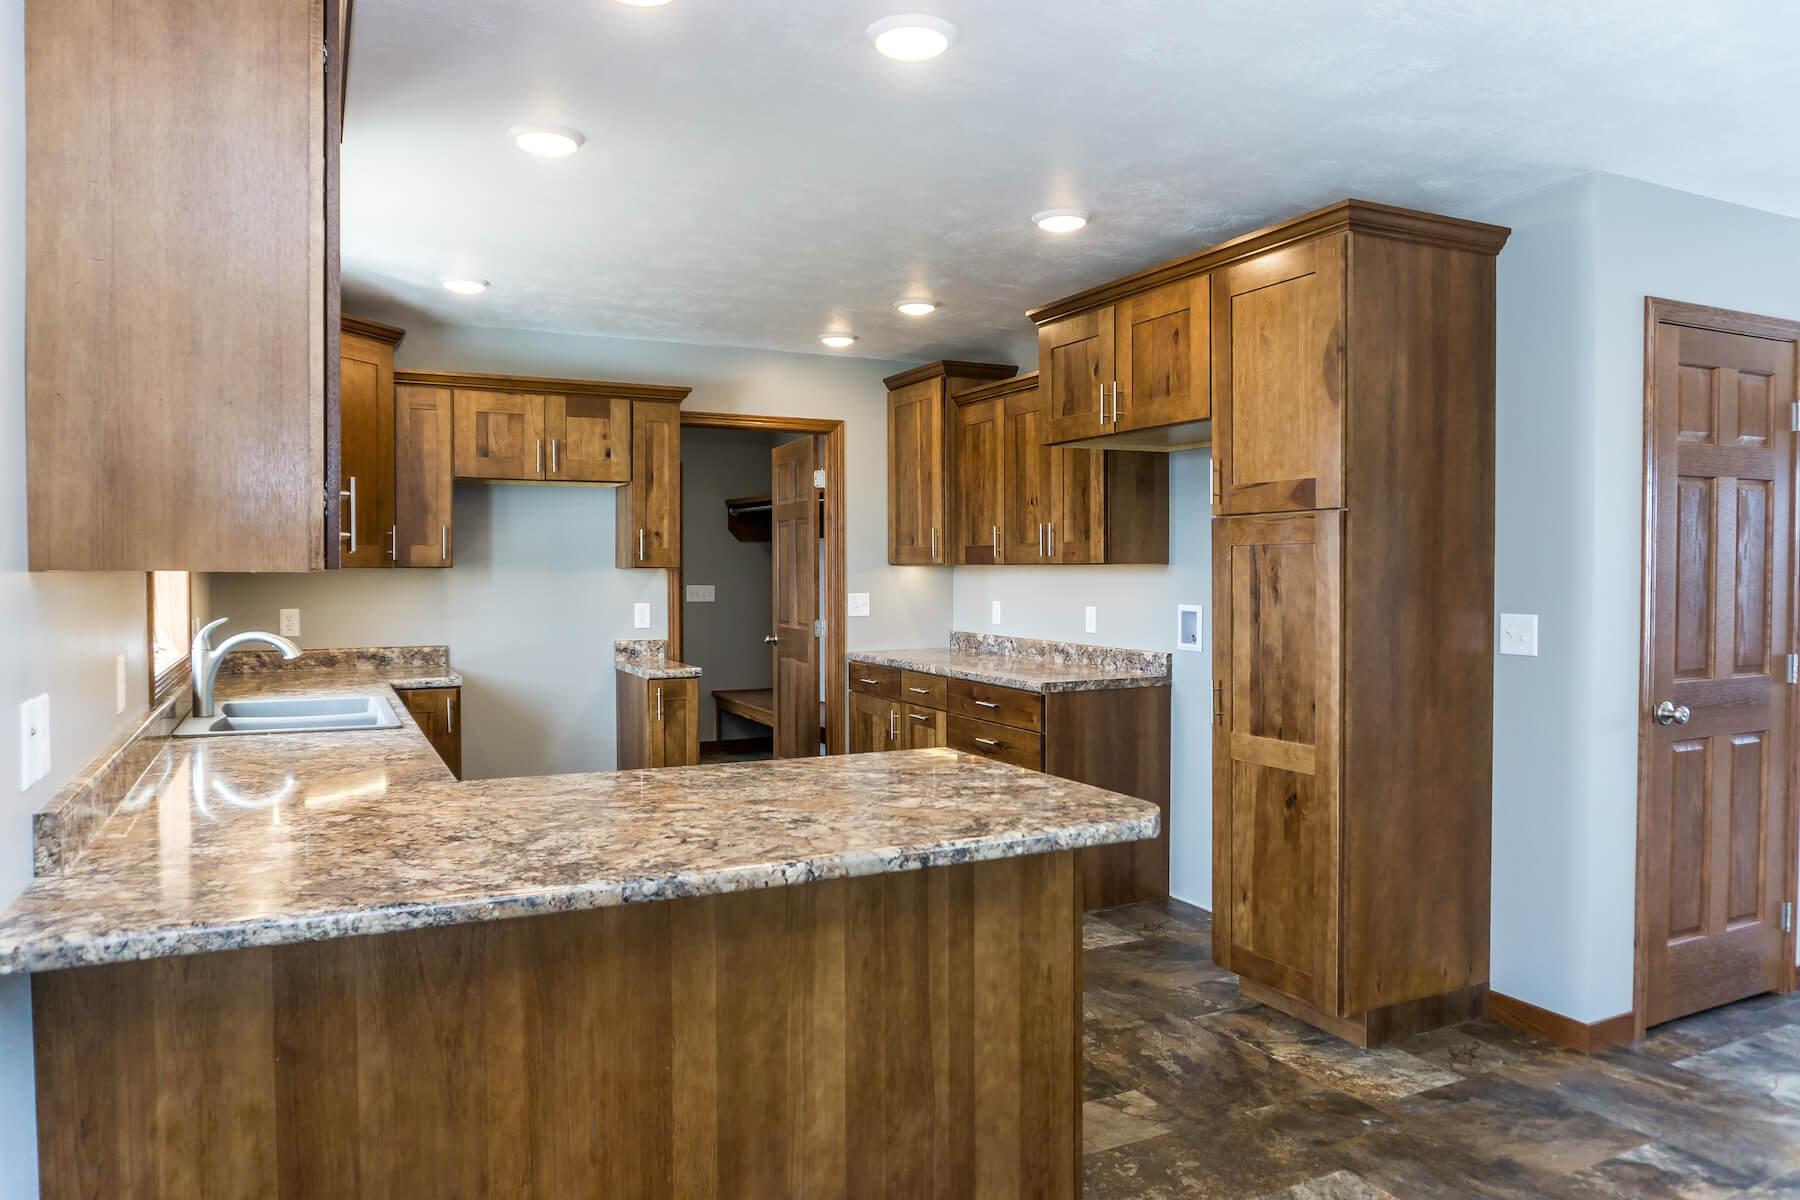 2019-4-12 Kemper Avenue Builders FirstSource Compressed  13.jpg